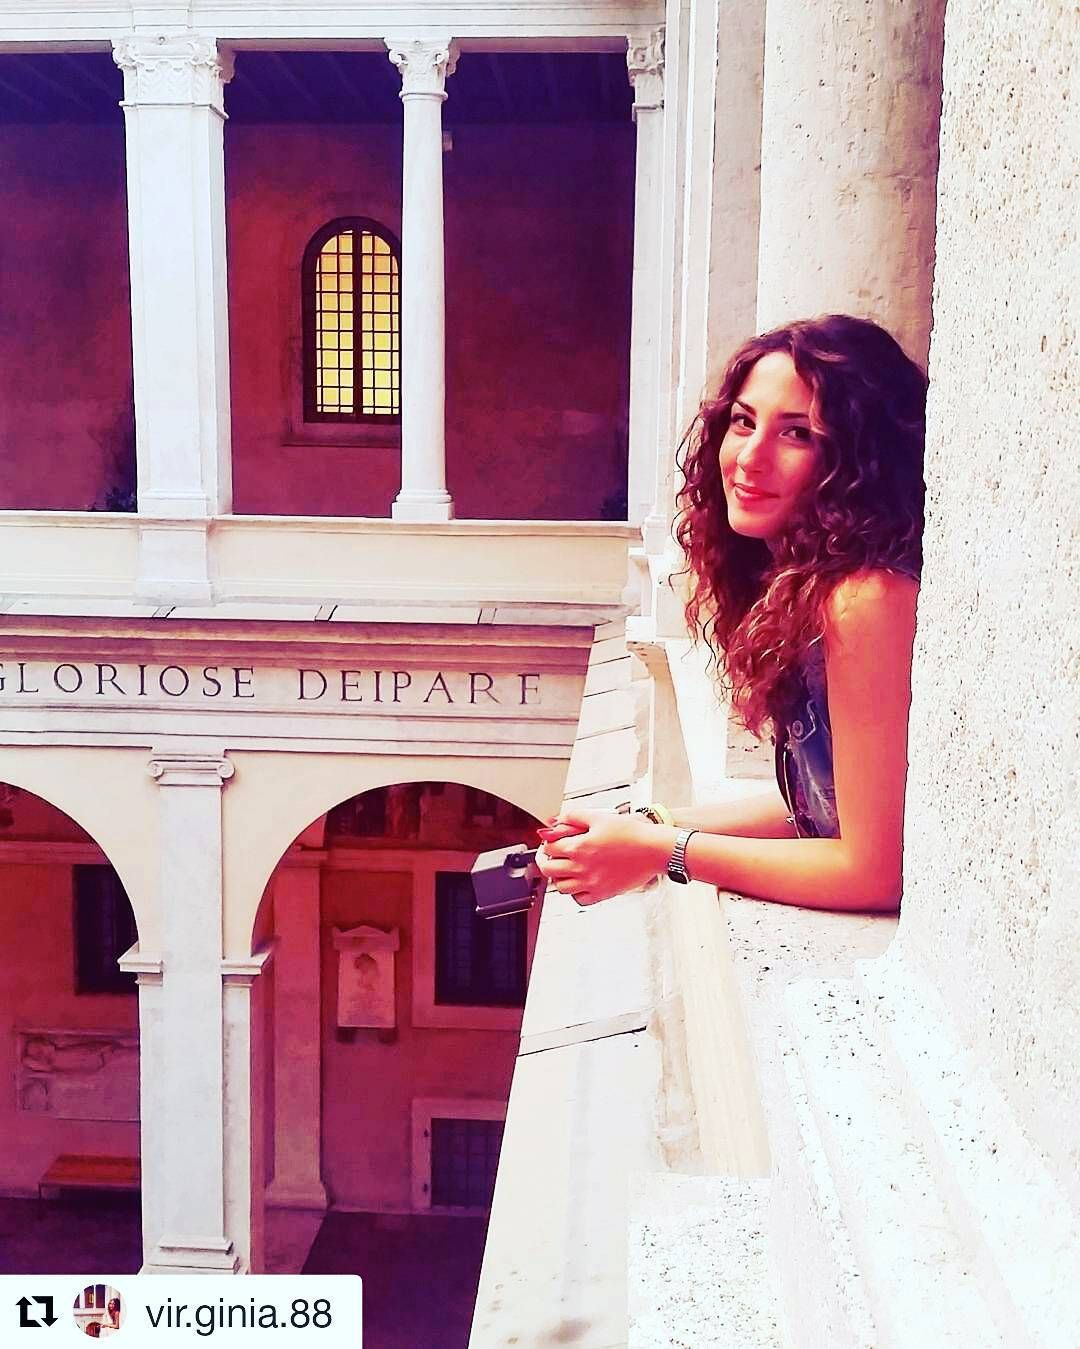 #photographylovers @vir.ginia.88   Spring attitude  #me #girl #rome #italy #june #spring #springattitude #sun #hotweather #chiostrodelbramante #mostra #exhibition #macchiaioli #saturday #culture #letslearnsomethingnew #interesting #amazingafternoon #placesworthseeing #aroundrome #scattirubati #photography #photooftheday #potd #samsungs5 #instacool #instaspring #igersroma #romanità